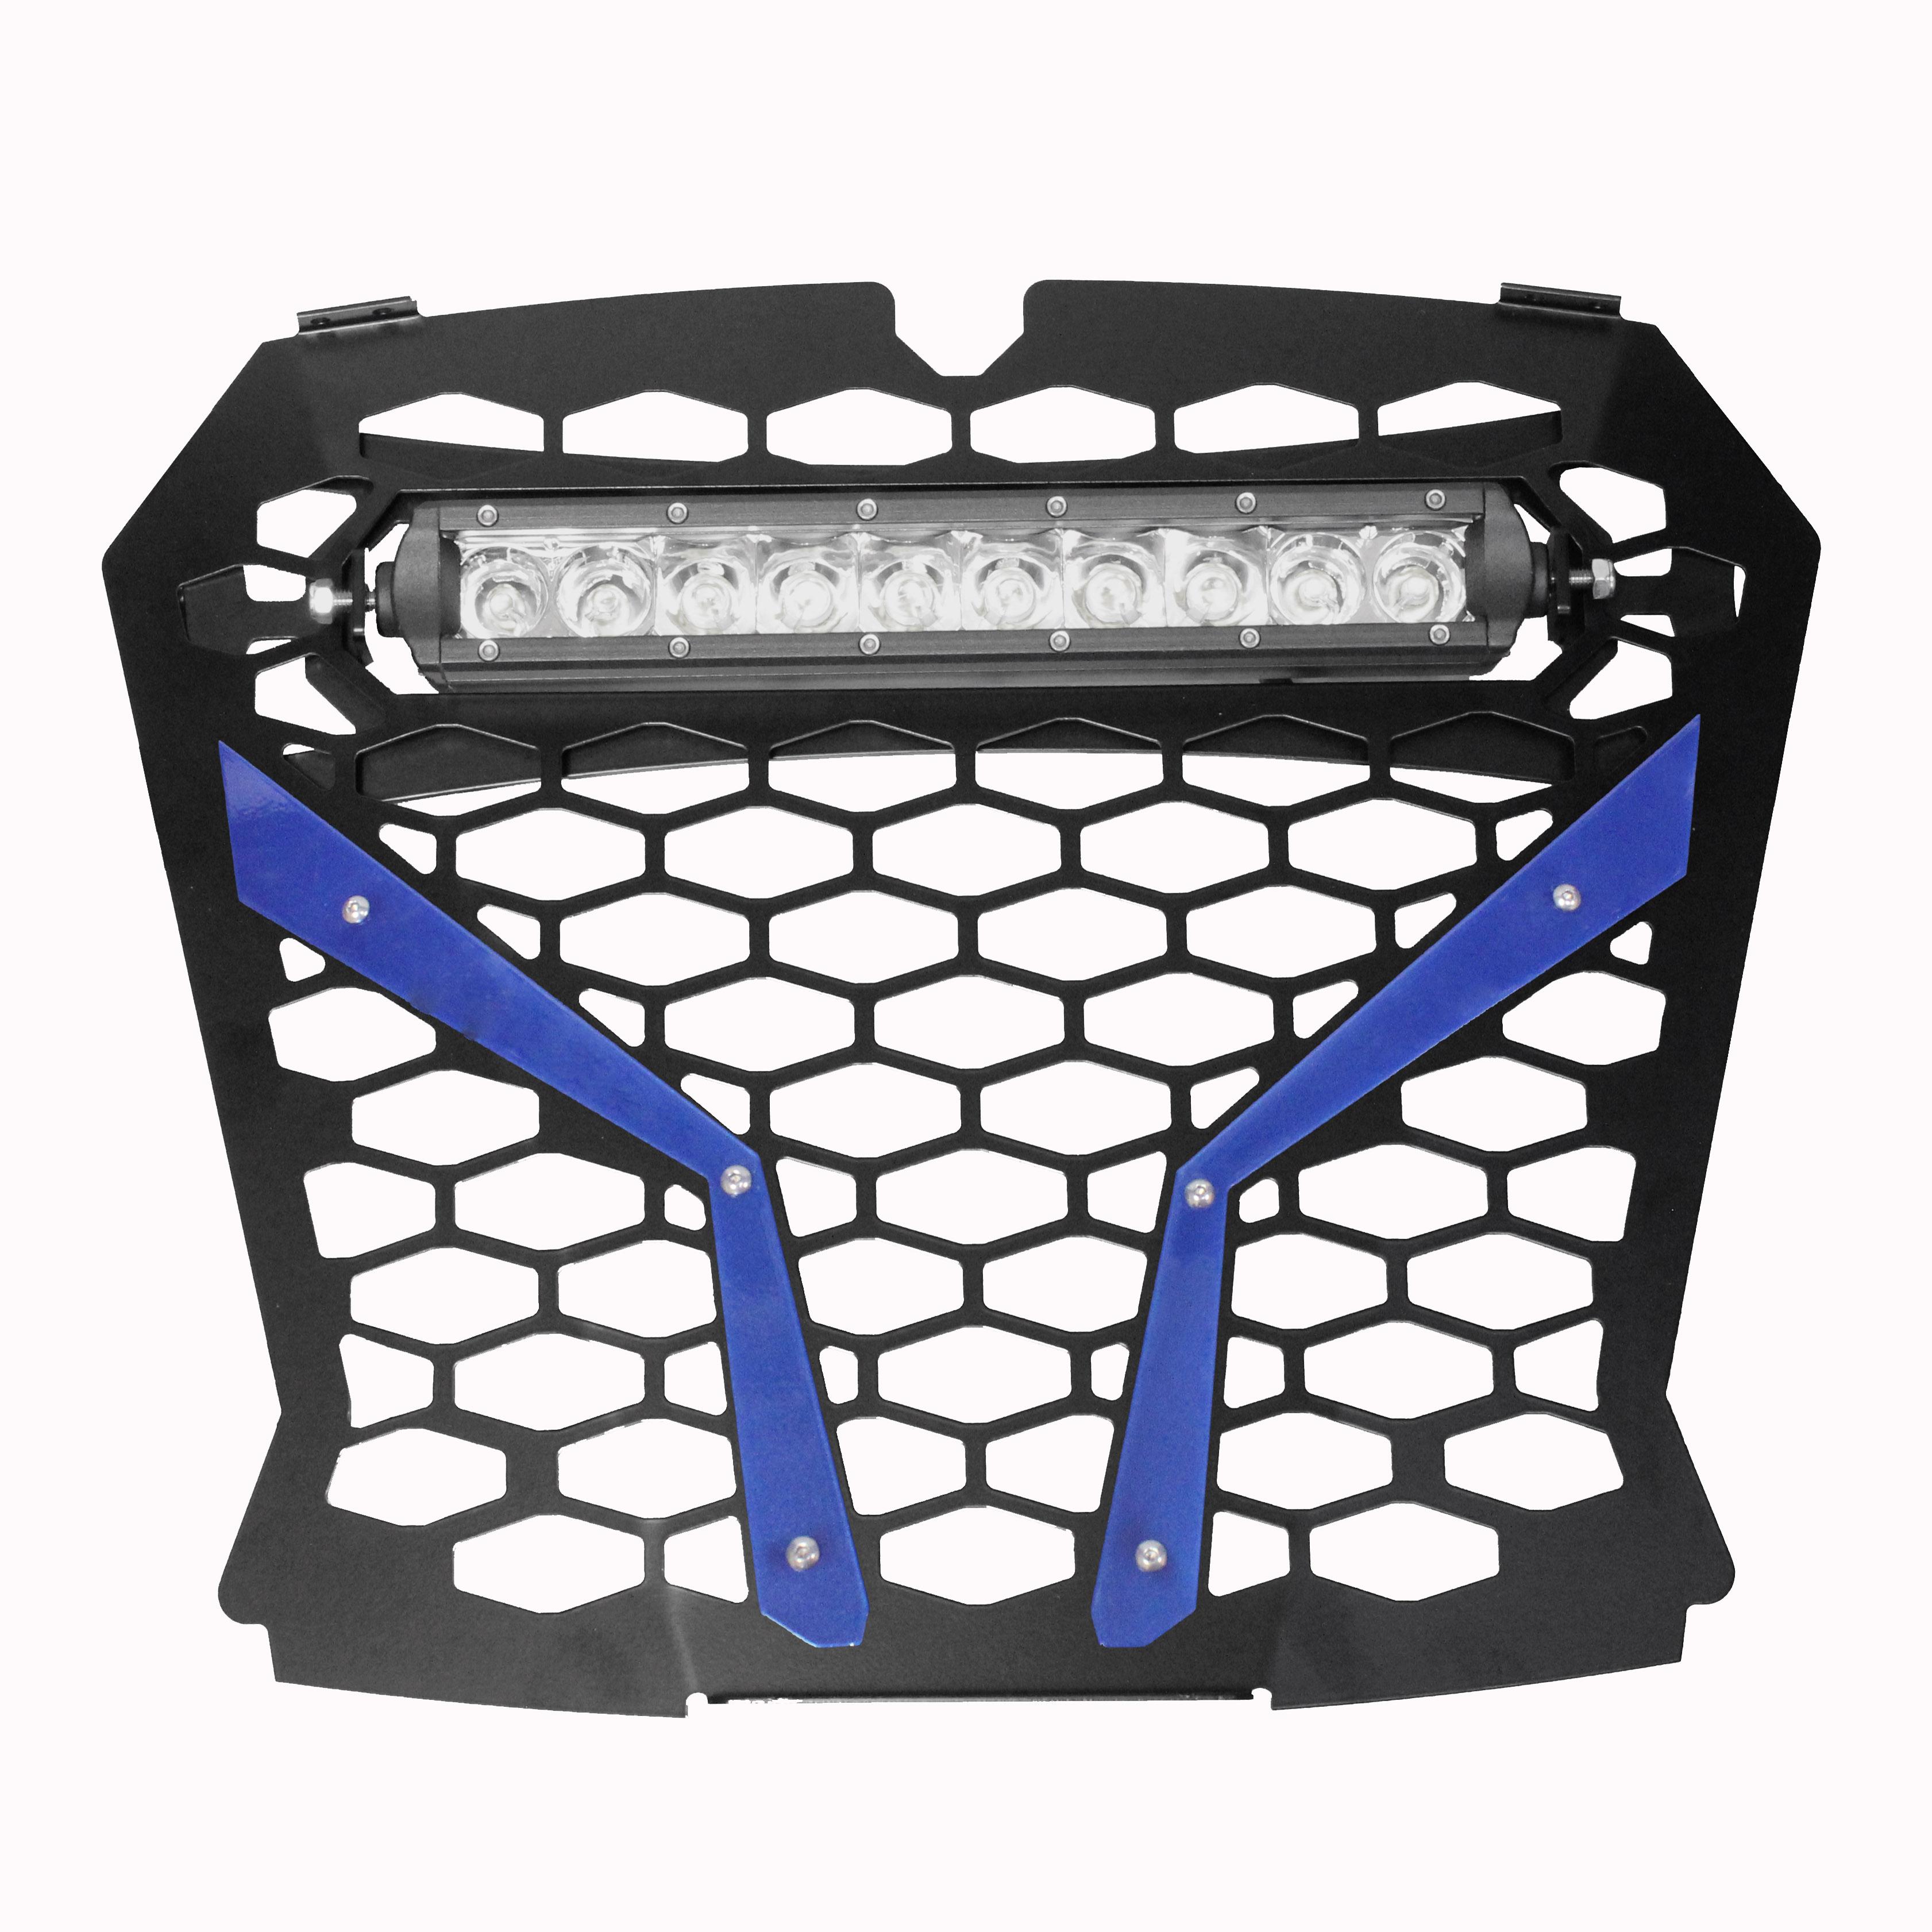 Gear Shift Knob Grip ModQuad Blue RZR-GRIP-BL